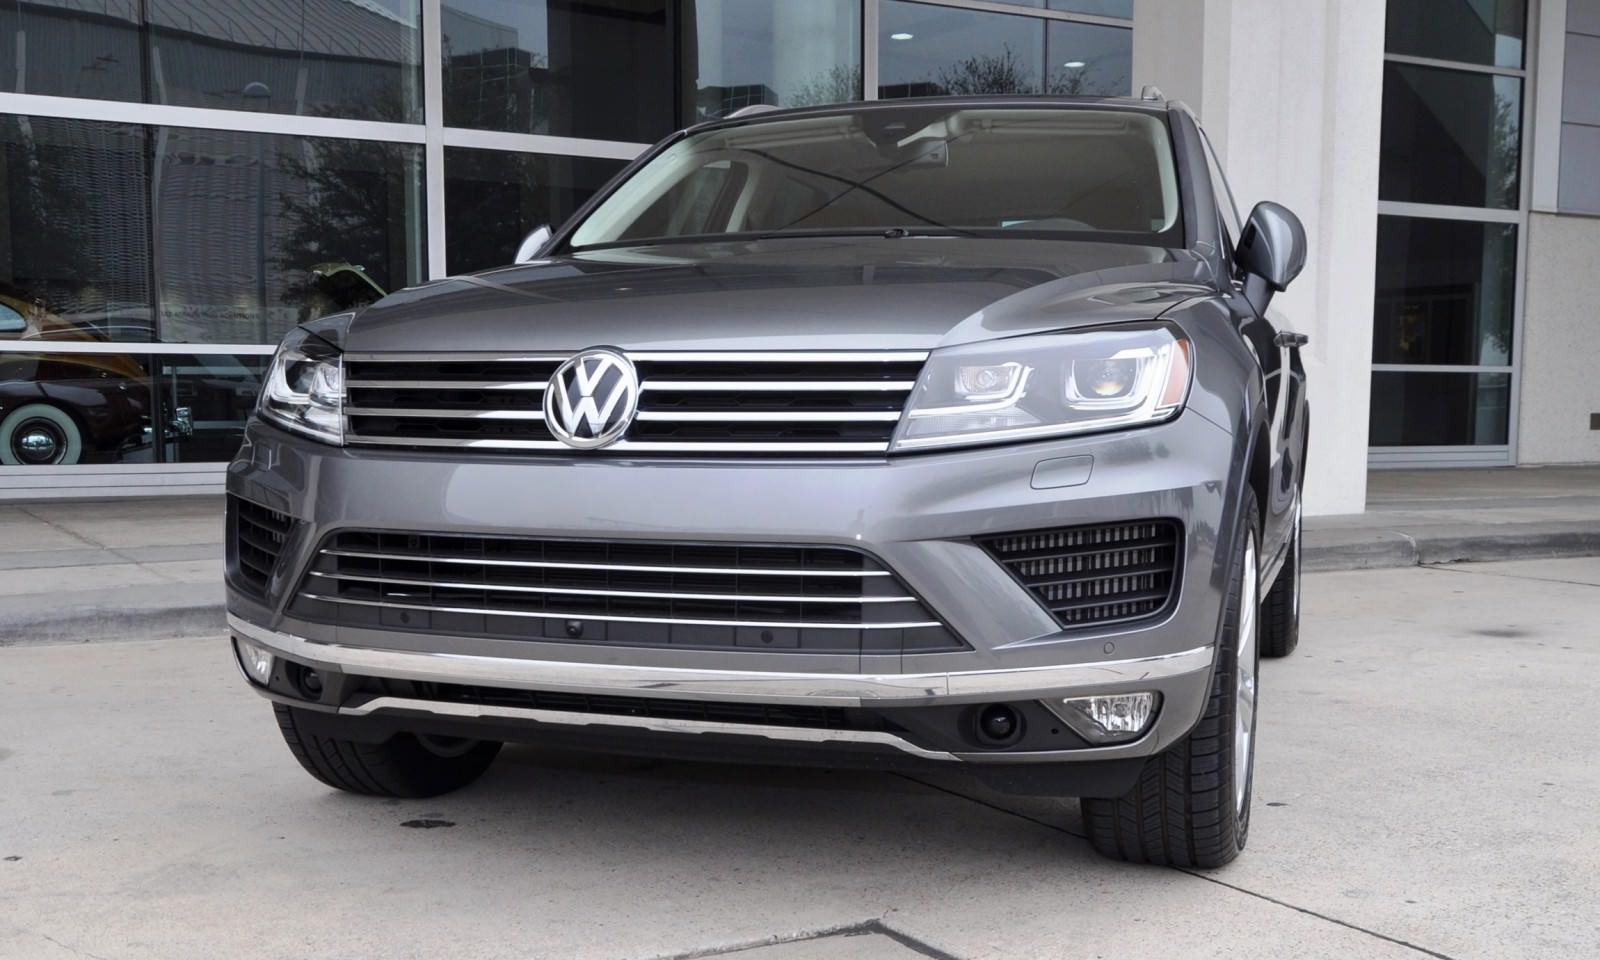 2015 Volkswagen Touareg TDI 15